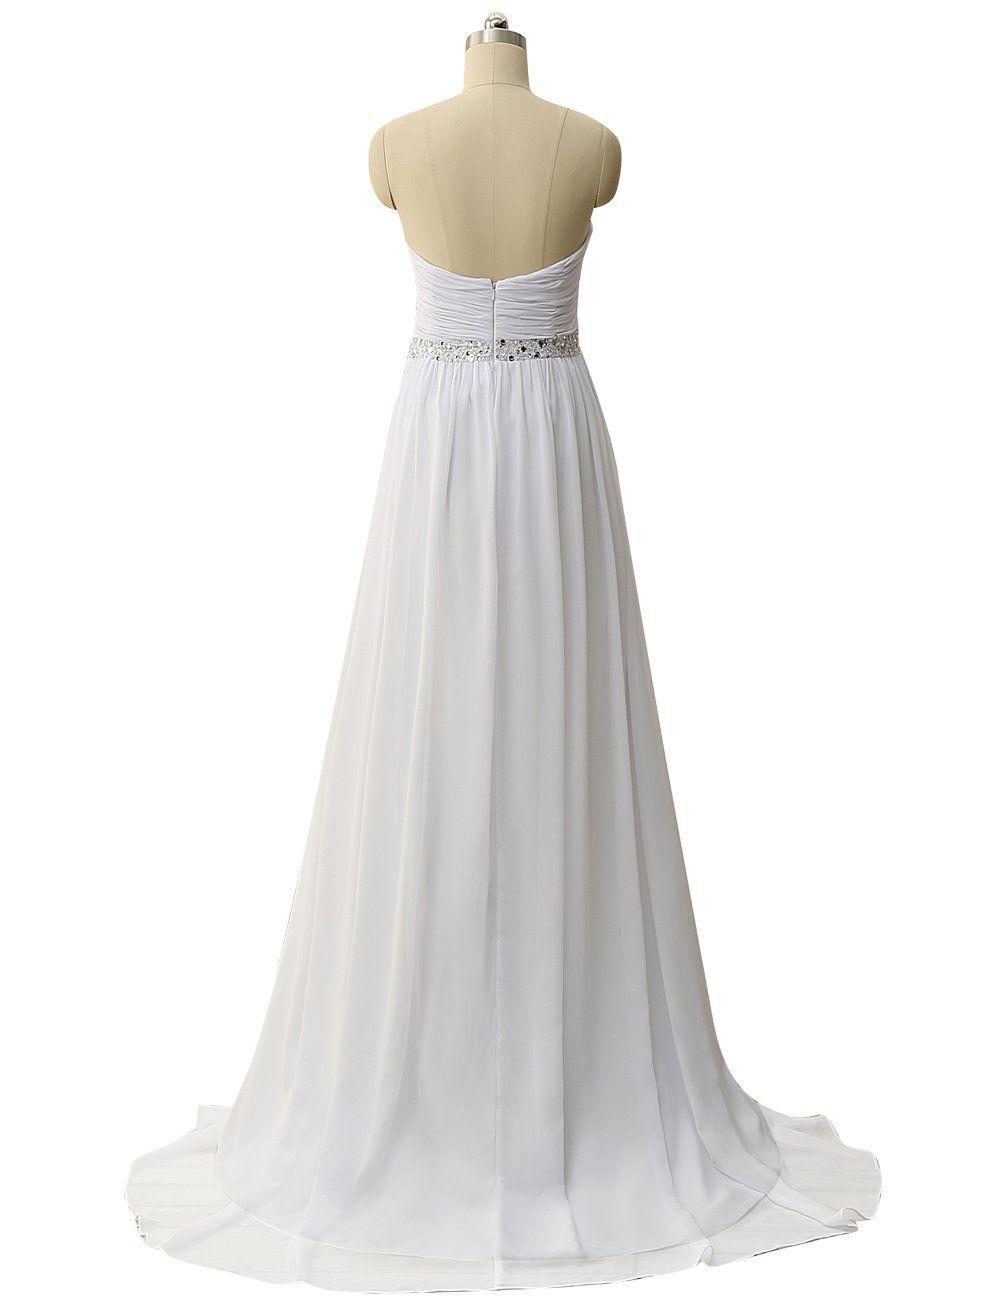 b4592185cd1 JAEDEN Strapless Beach Wedding Dresses For Birde Simple Chiffon Bridal Gown  Pleat Ivory US22W